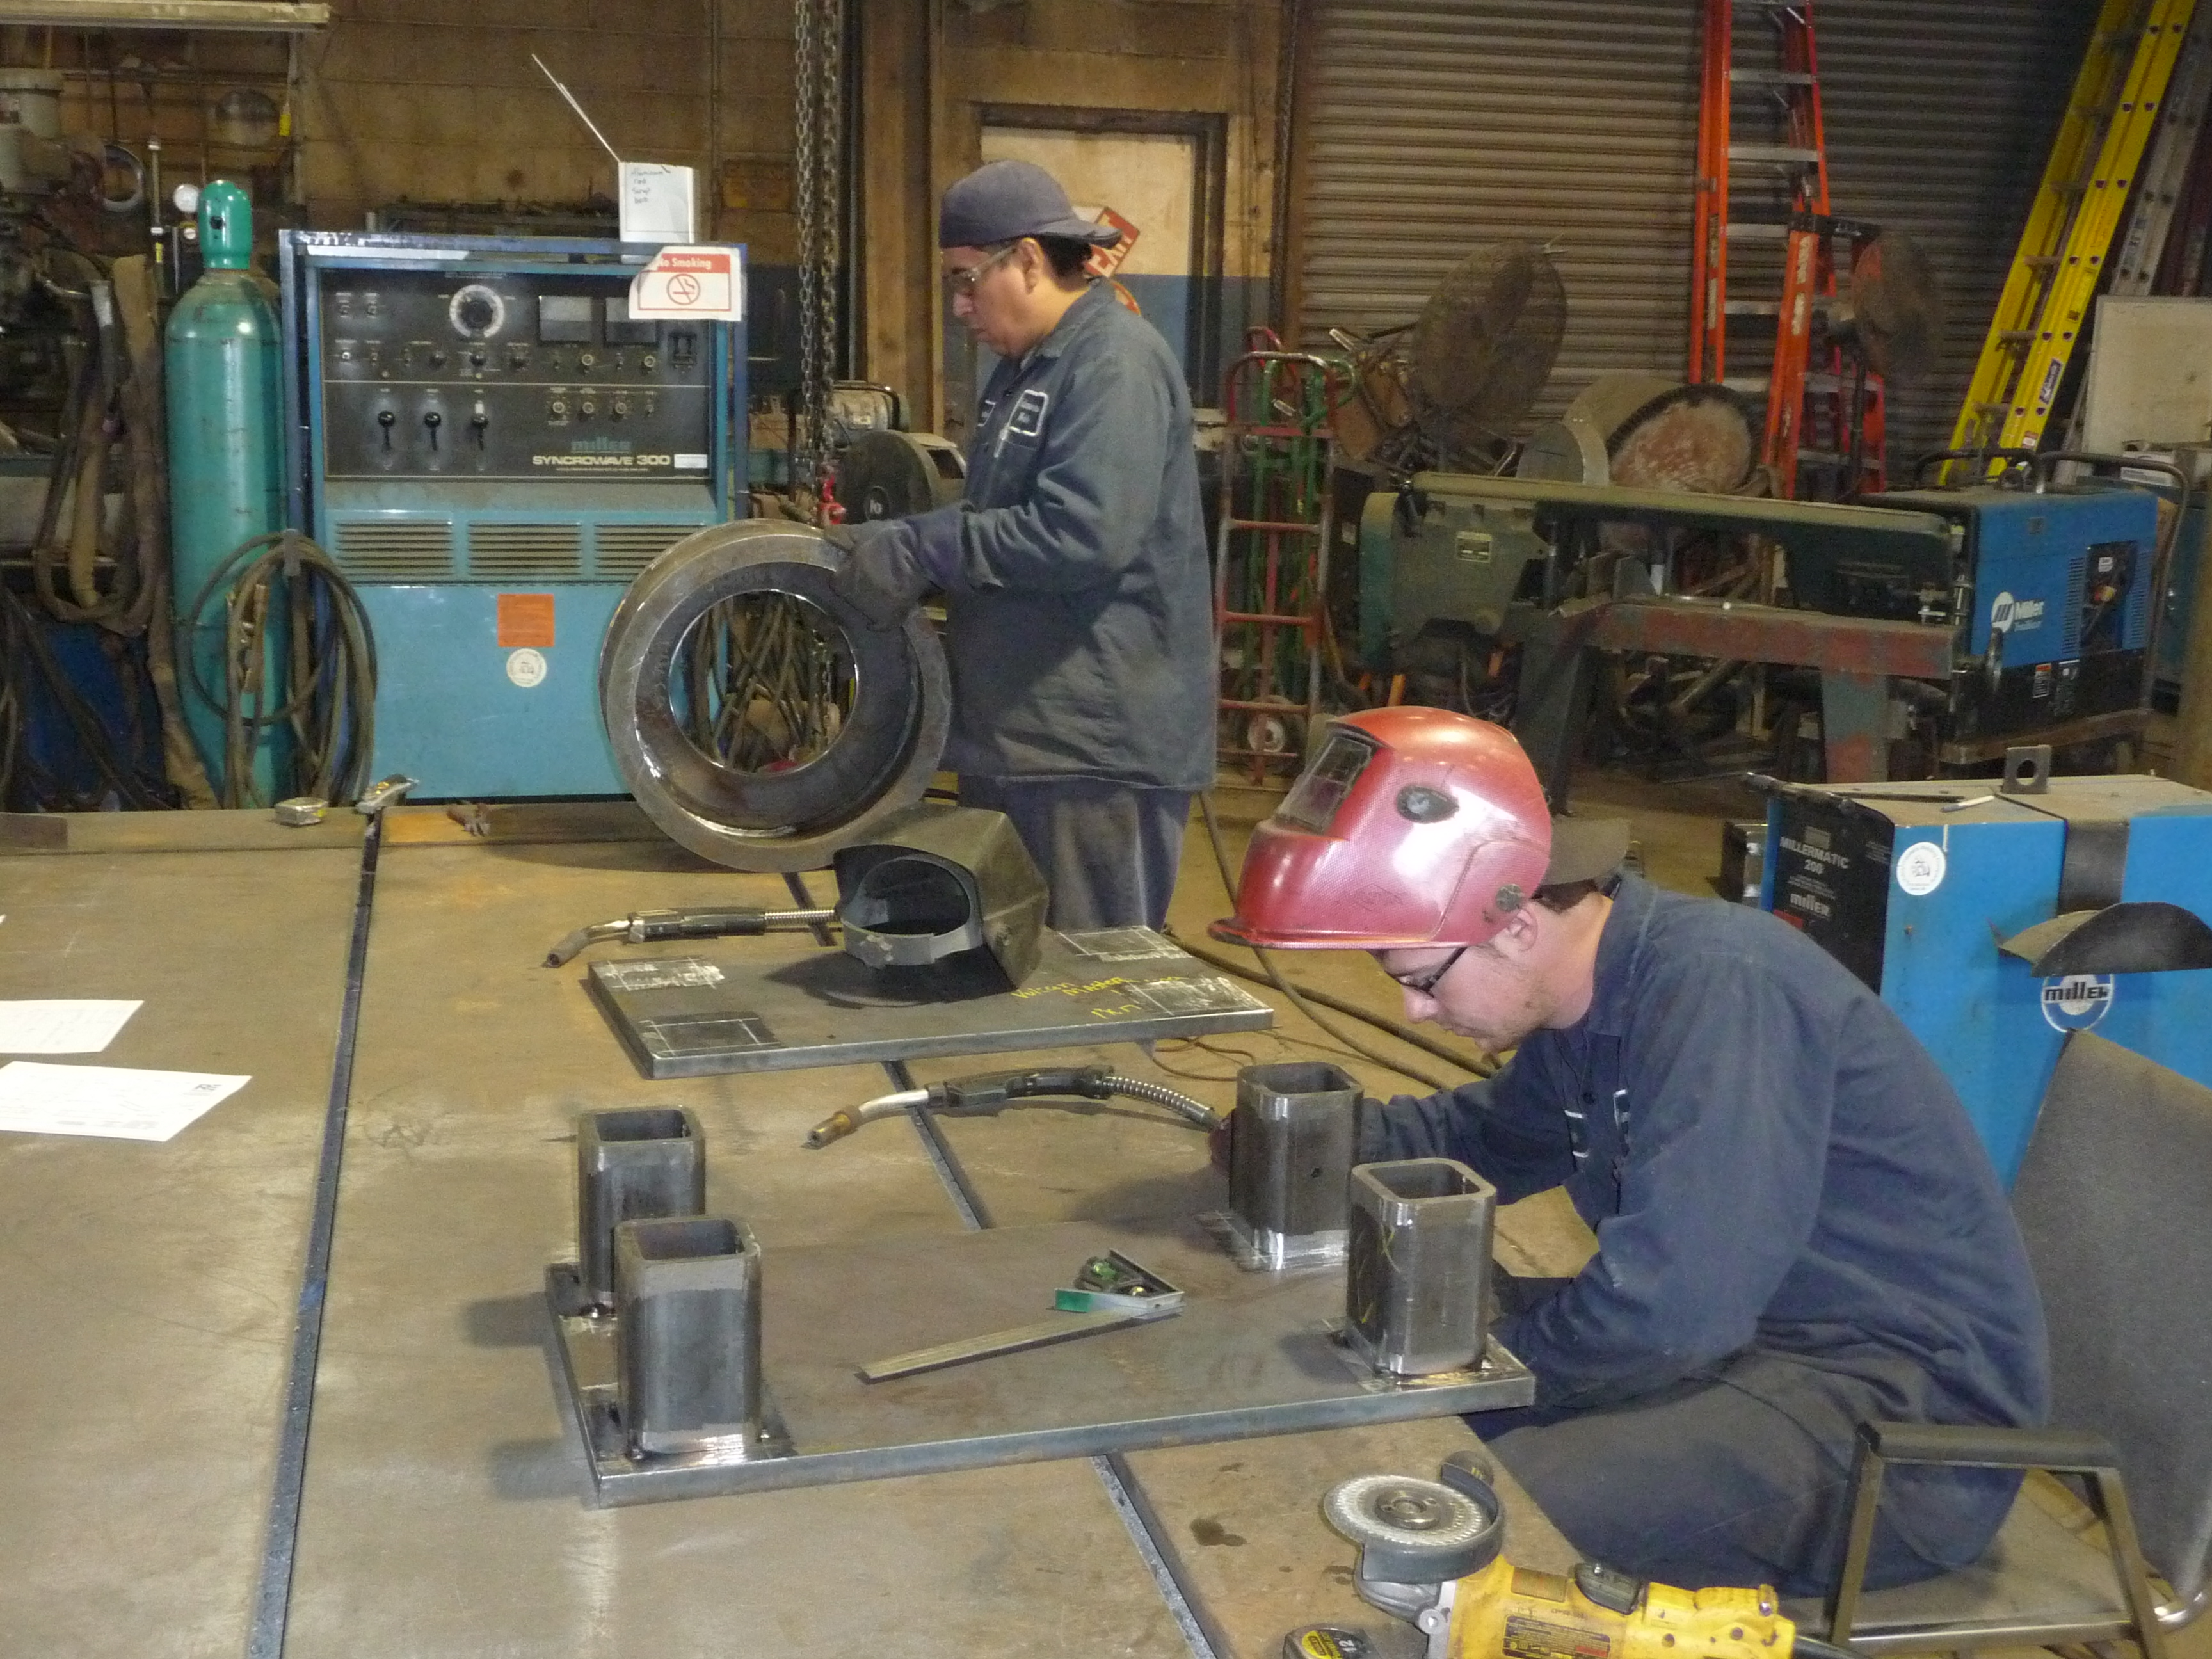 Vulcanmasters Welding - Detroit, MI 48217 - (313)843-5043 | ShowMeLocal.com